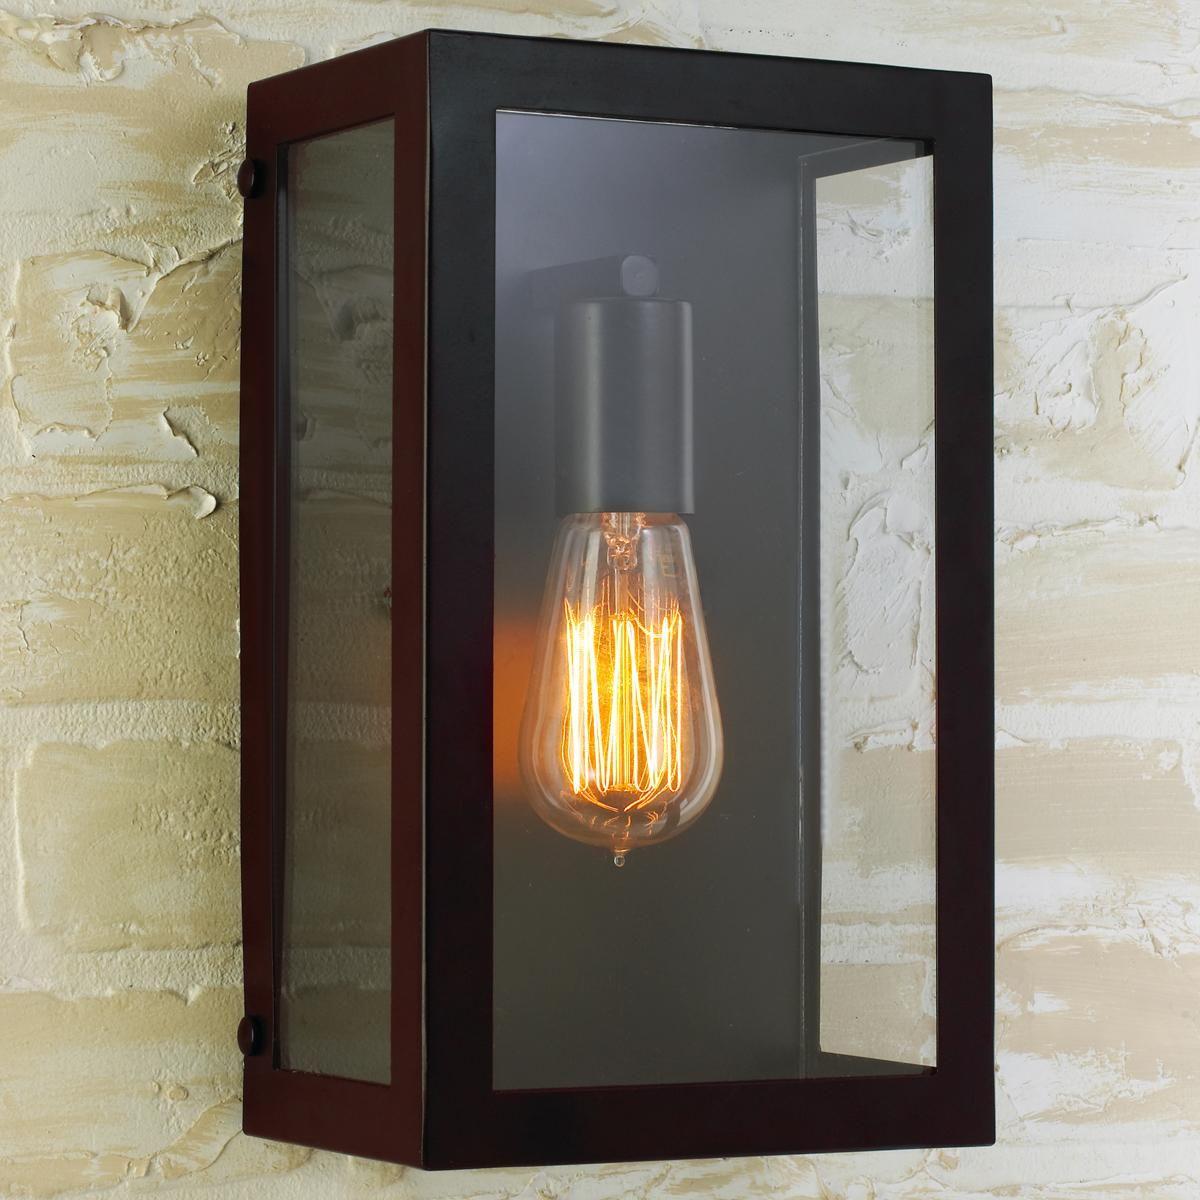 Modern Industrial Wall Sconce | Lighting | Pinterest ...